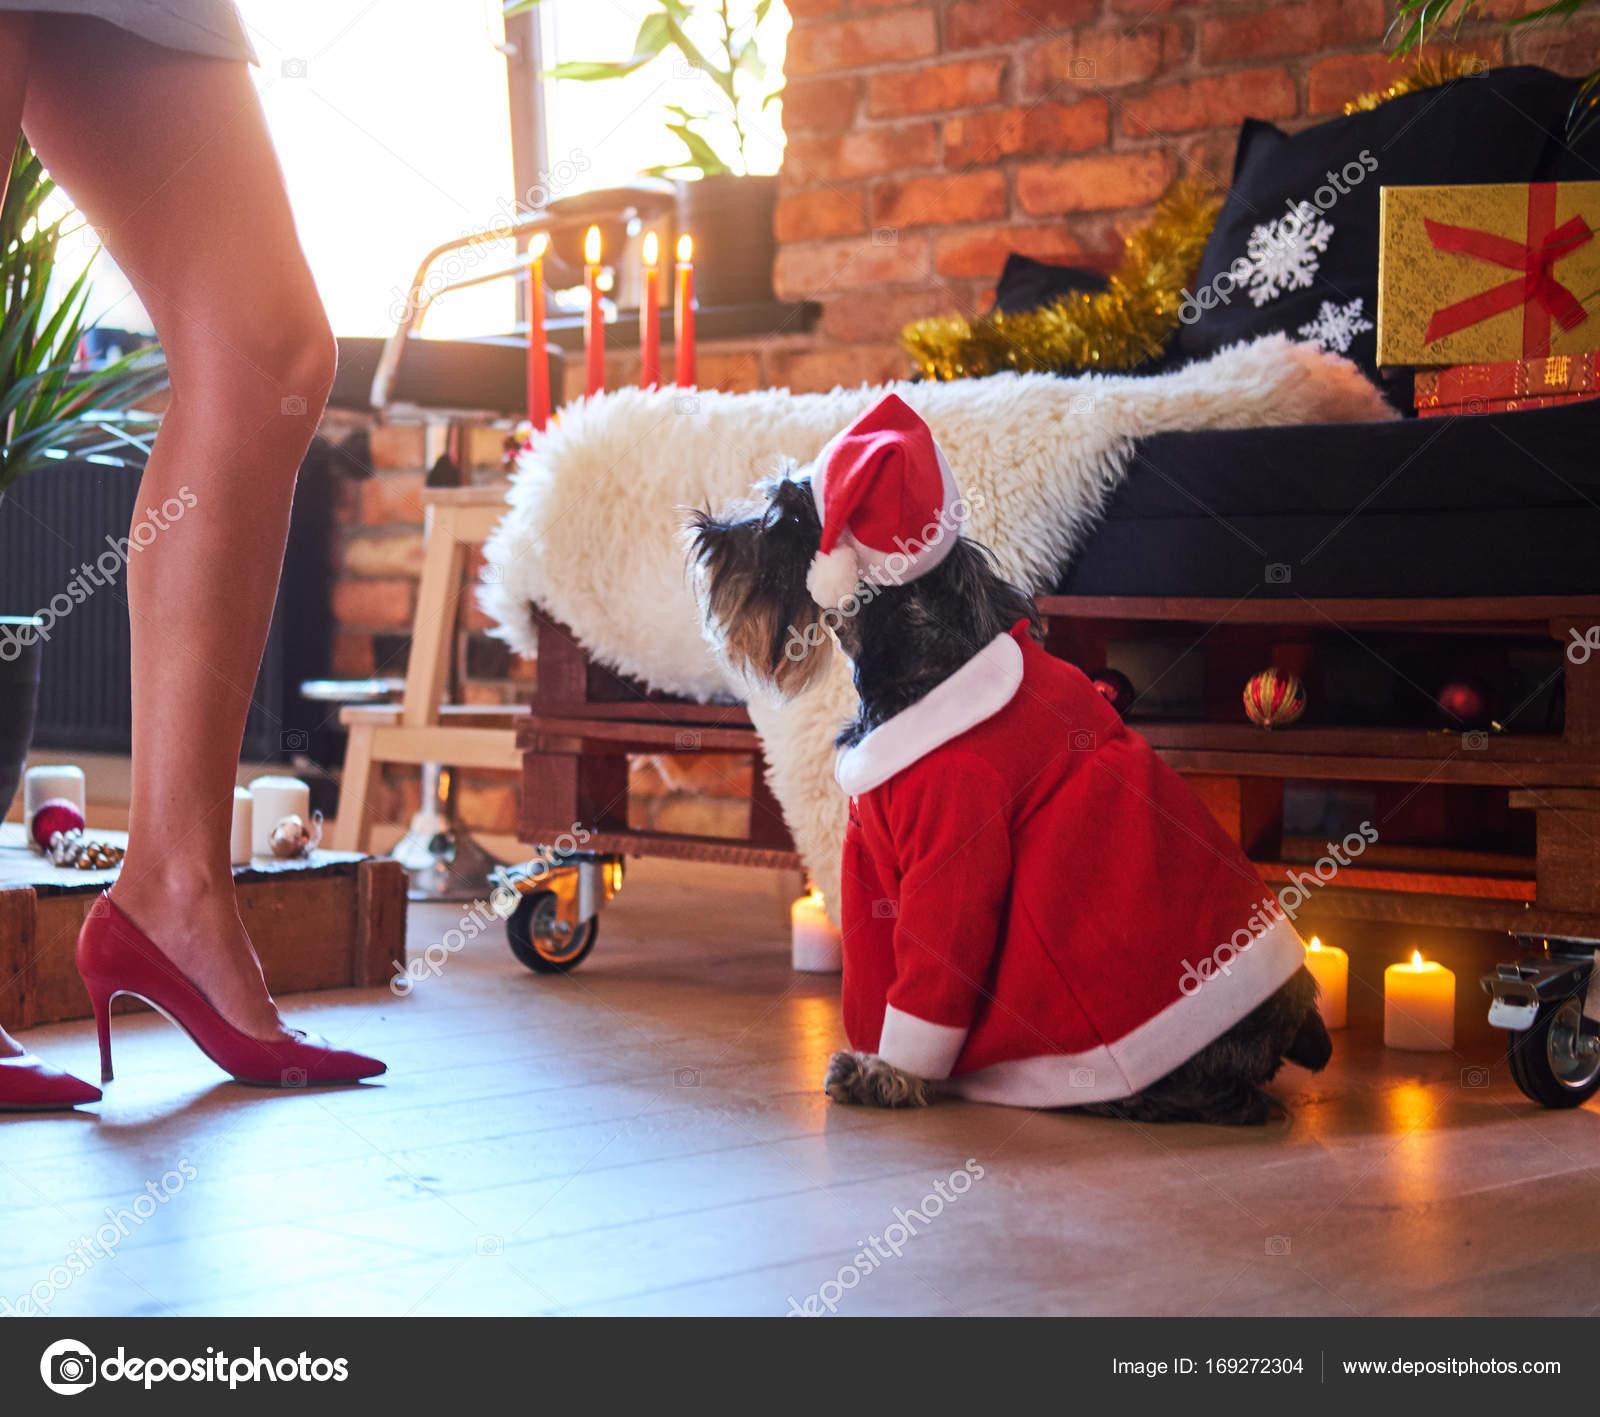 Schnauzer-hund klädd i jul kläder — Stockfotografi © fxquadro  169272304 be78e73aa41e8